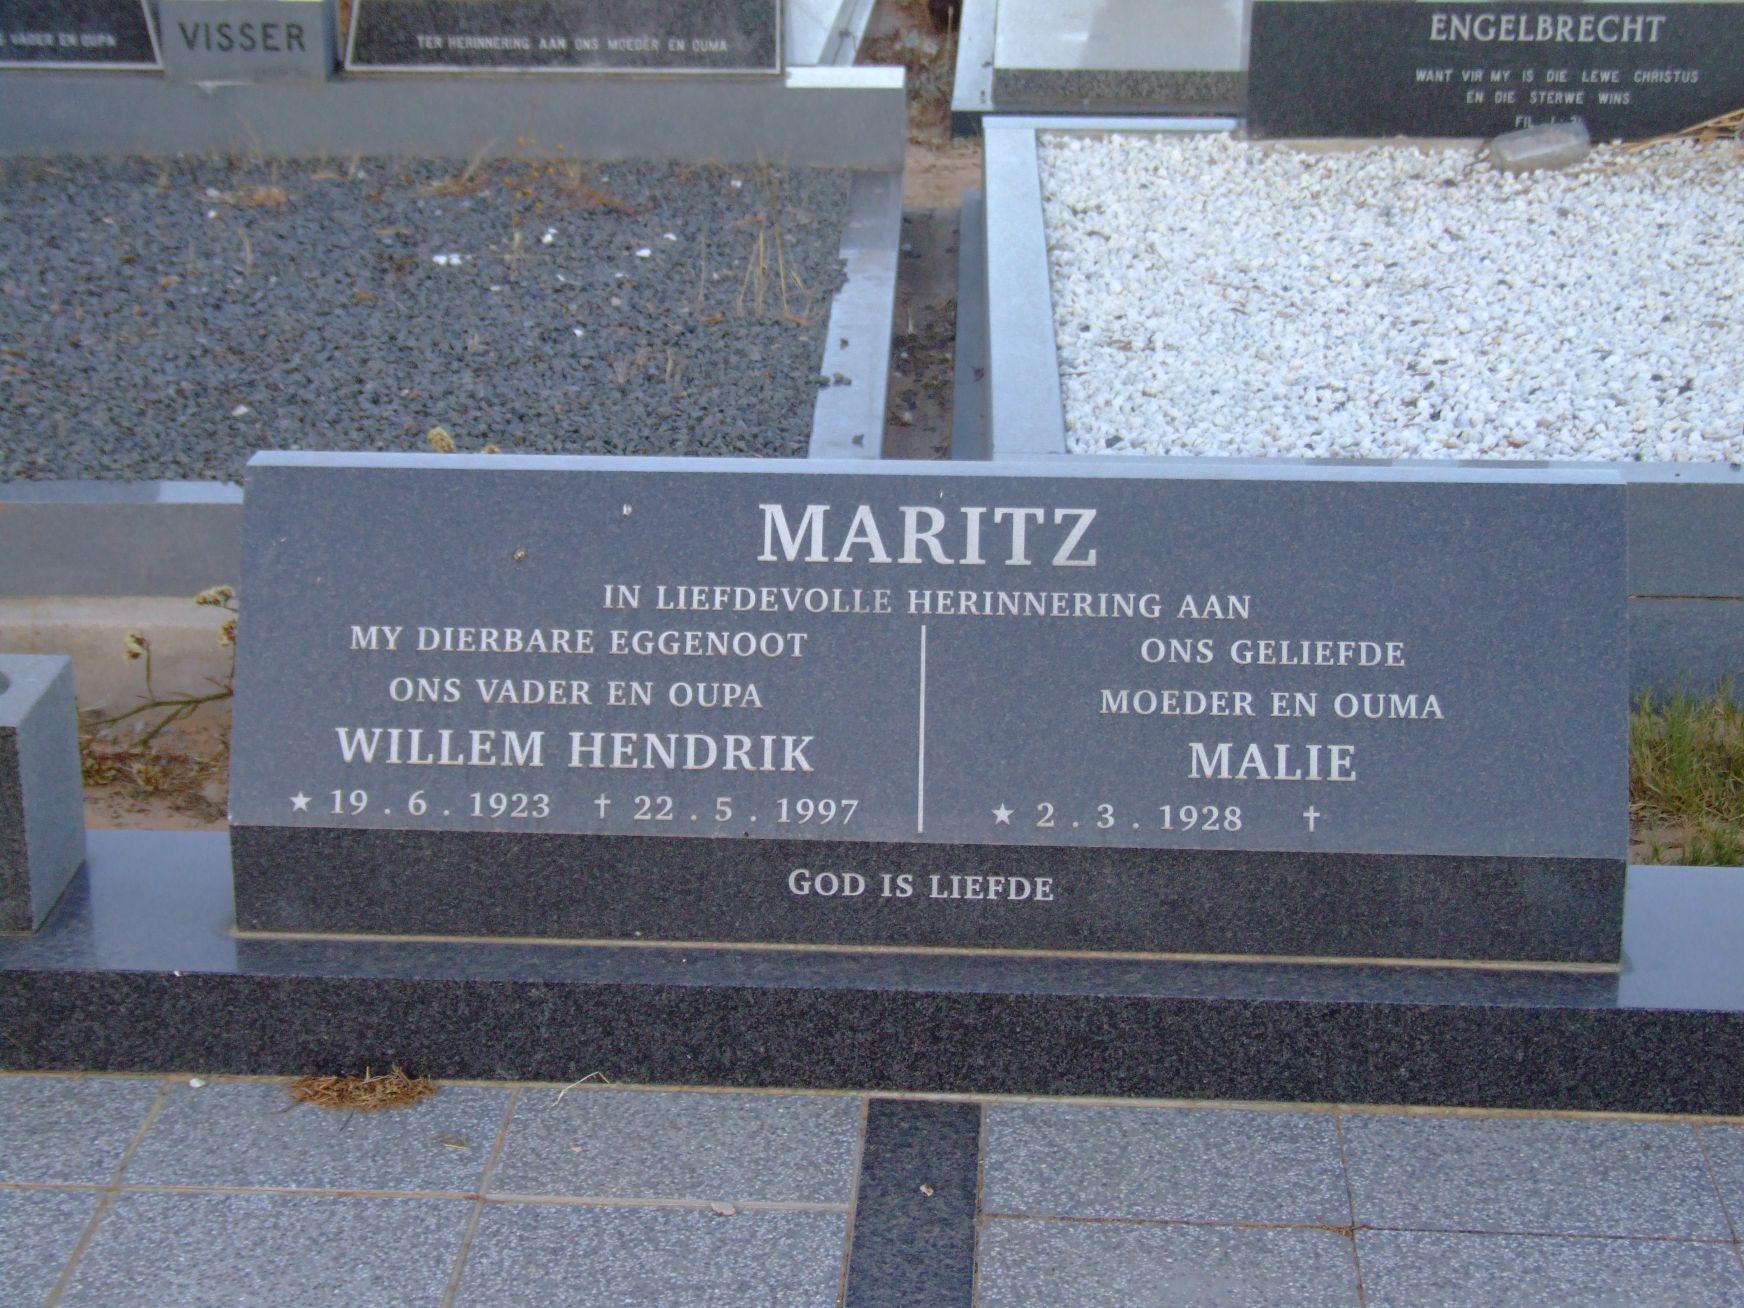 Maritz, Willem Hendrik and Malie